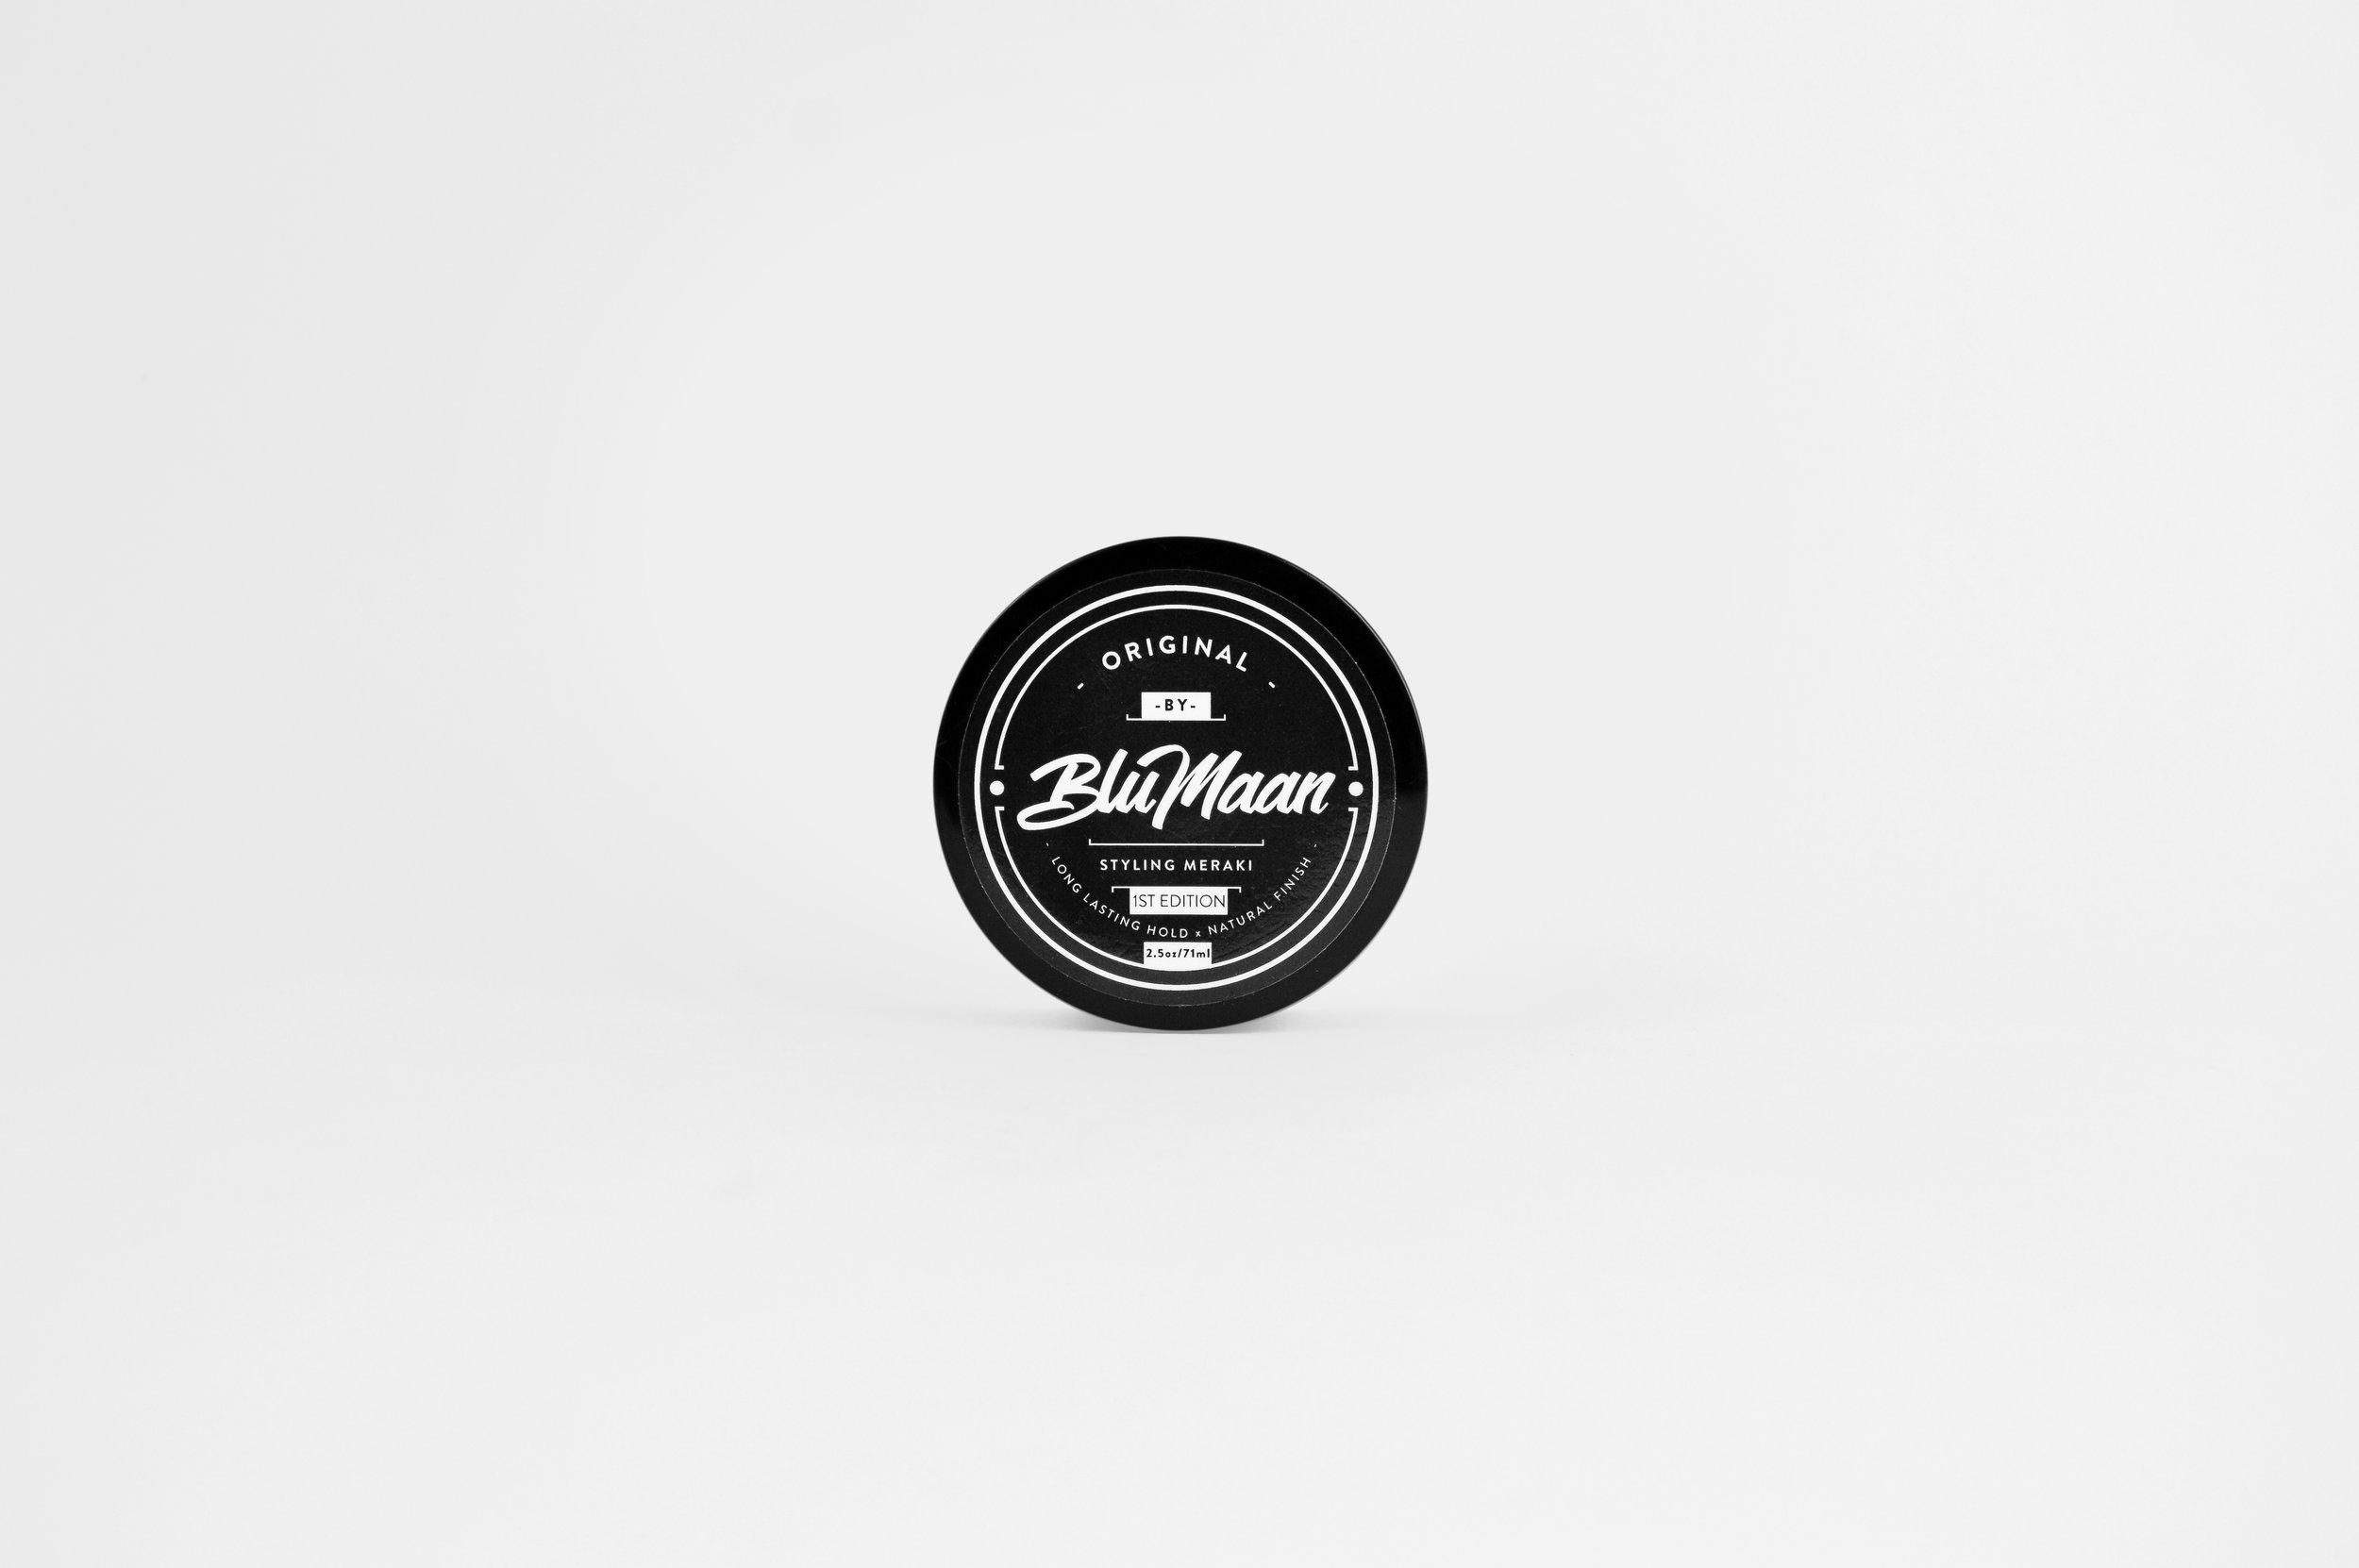 BluMaan - Original - Promo 1.jpg